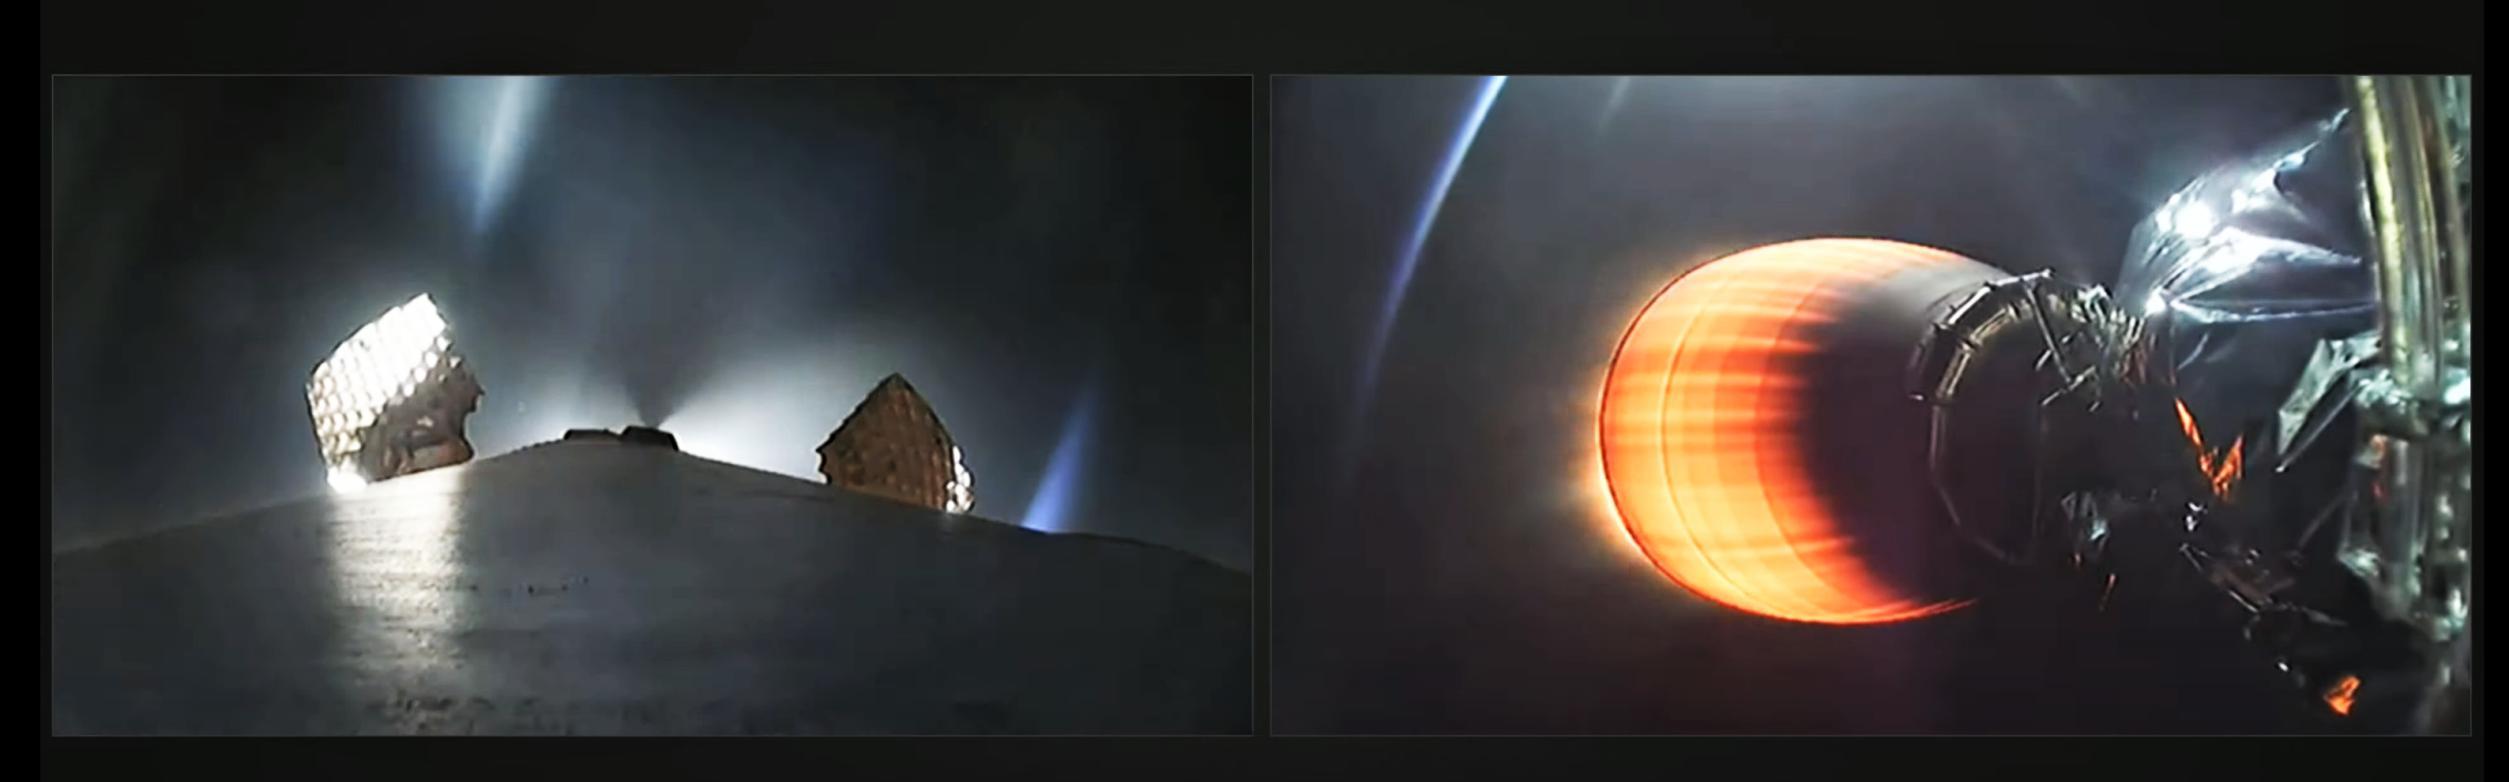 Inspiration4 Dragon C207 F9 B1062 091521 webcast (SpaceX) launch 6 (c)